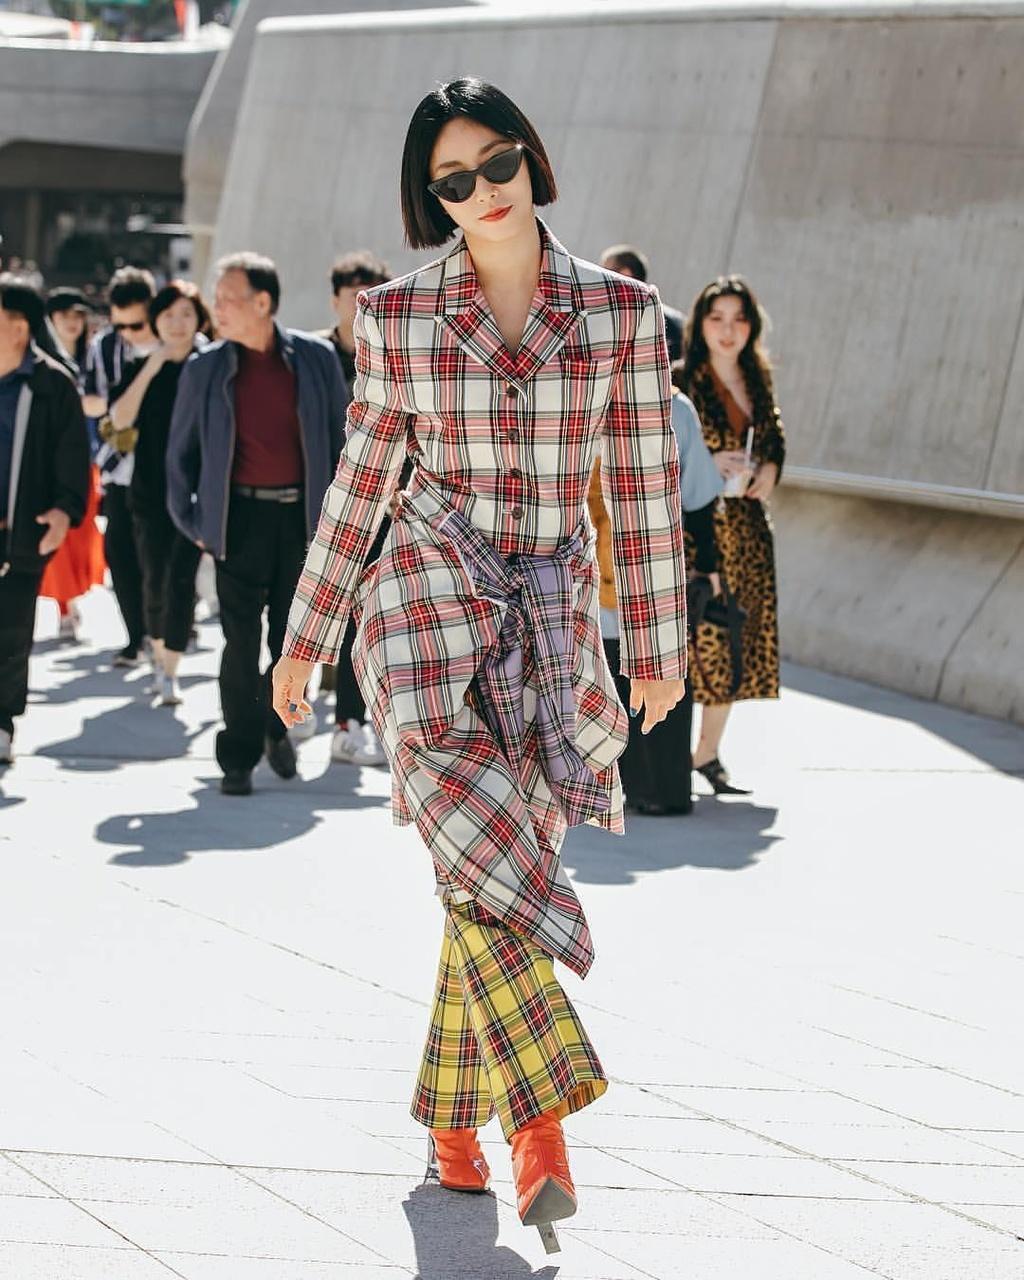 Hinh anh A quan The Face tai Seoul Fashion Week len Vogue hinh anh 15